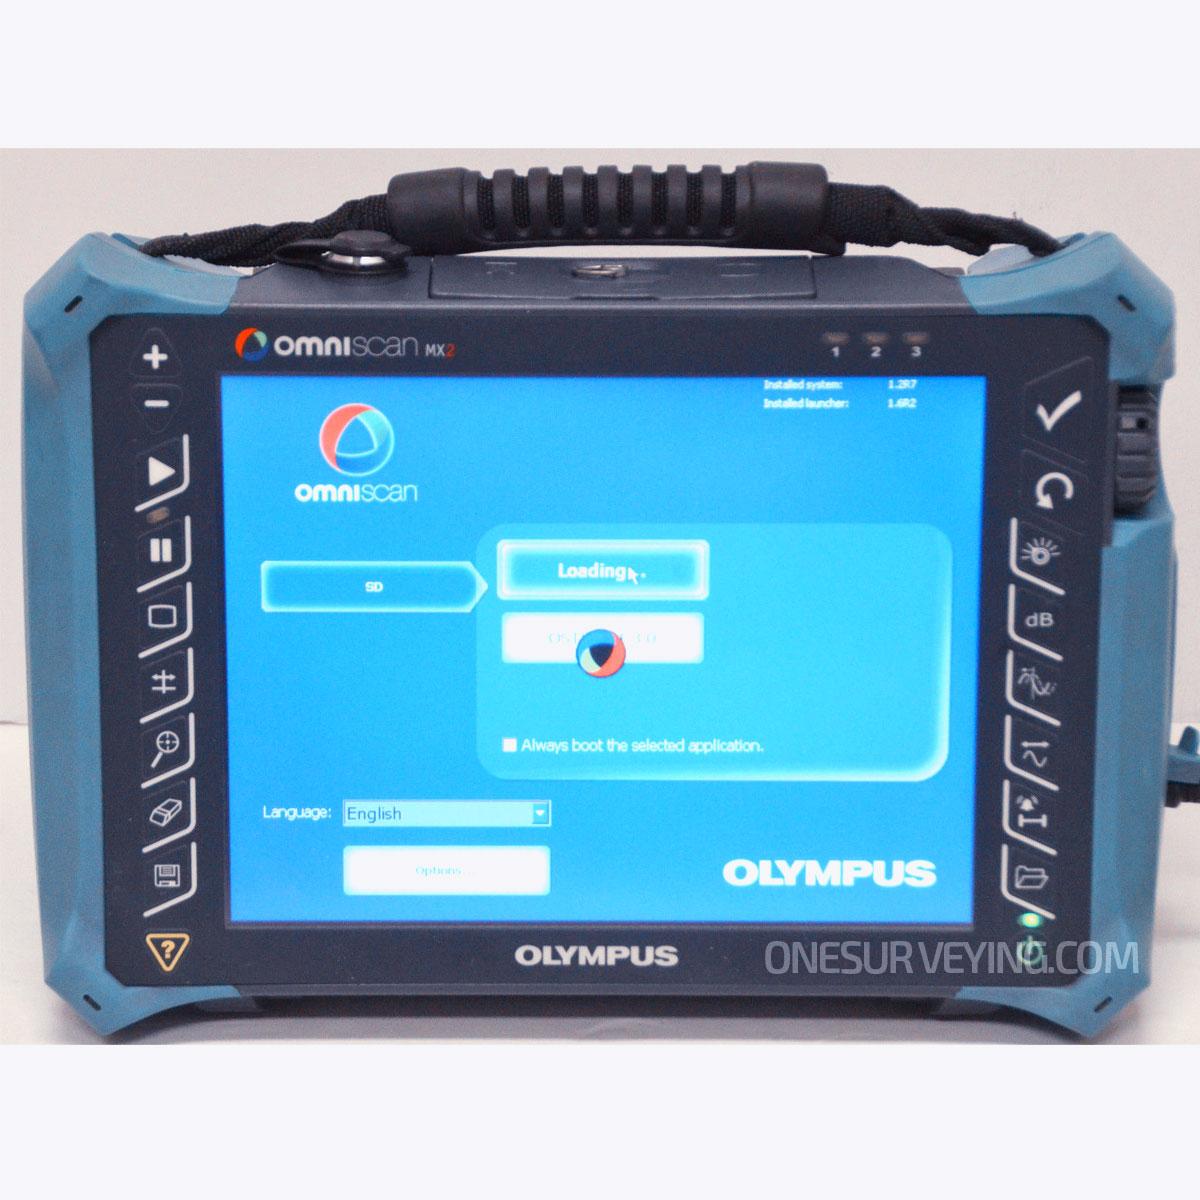 Olympus-OmniScan-MX2-16-128-price.jpg